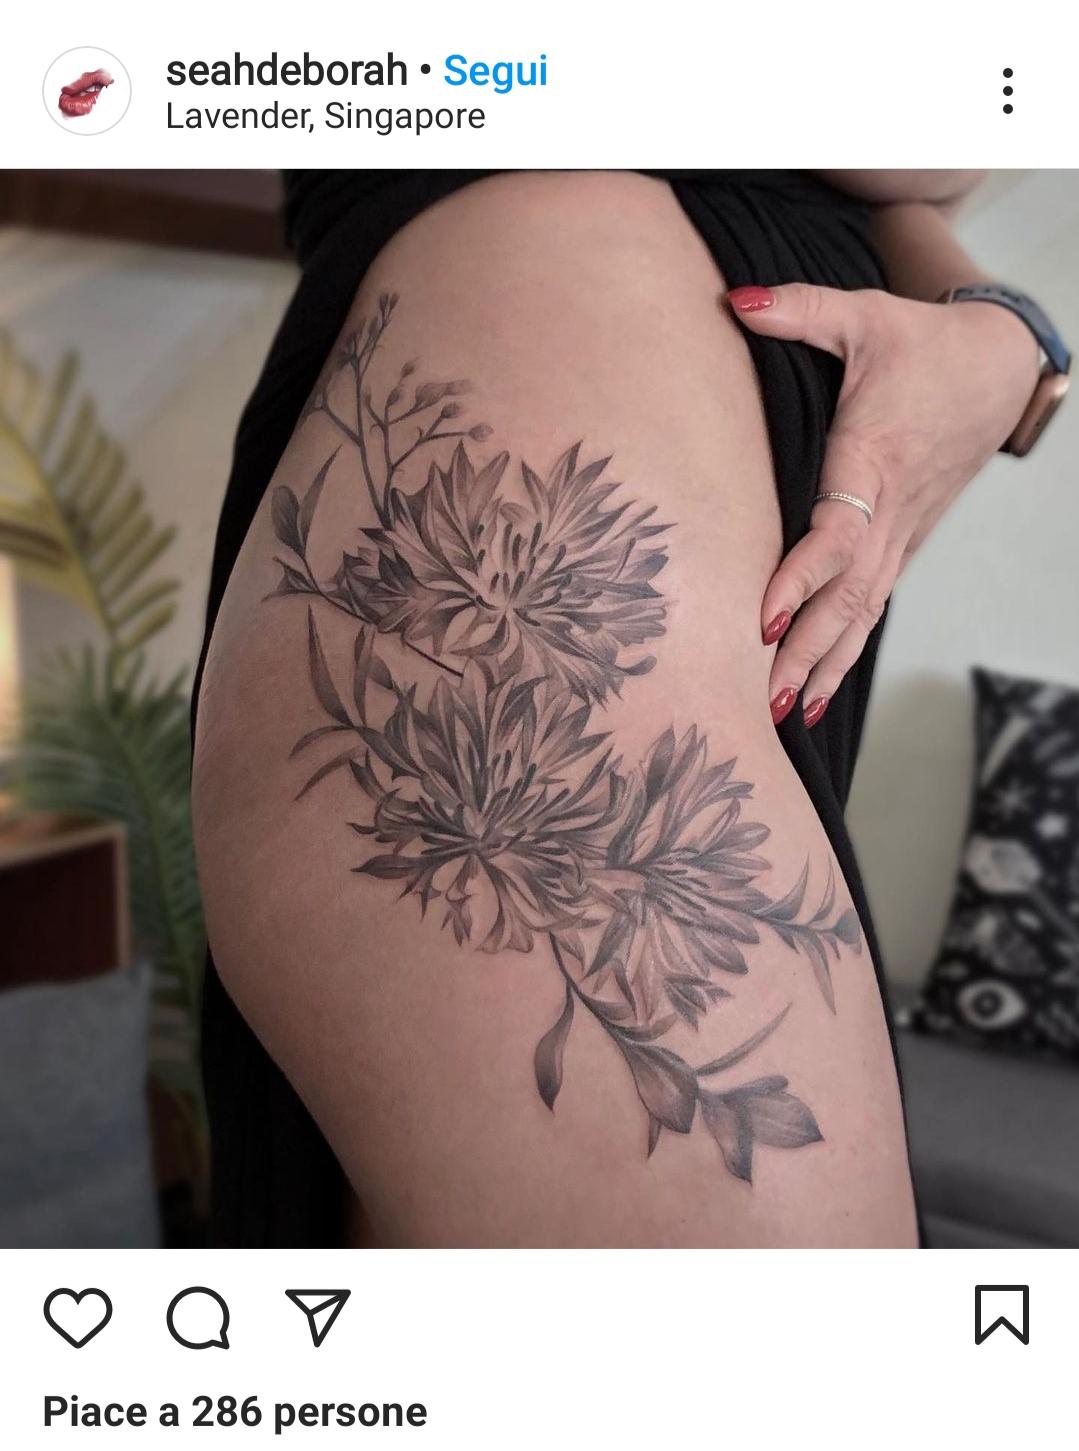 Tatuaggio cosce grosse